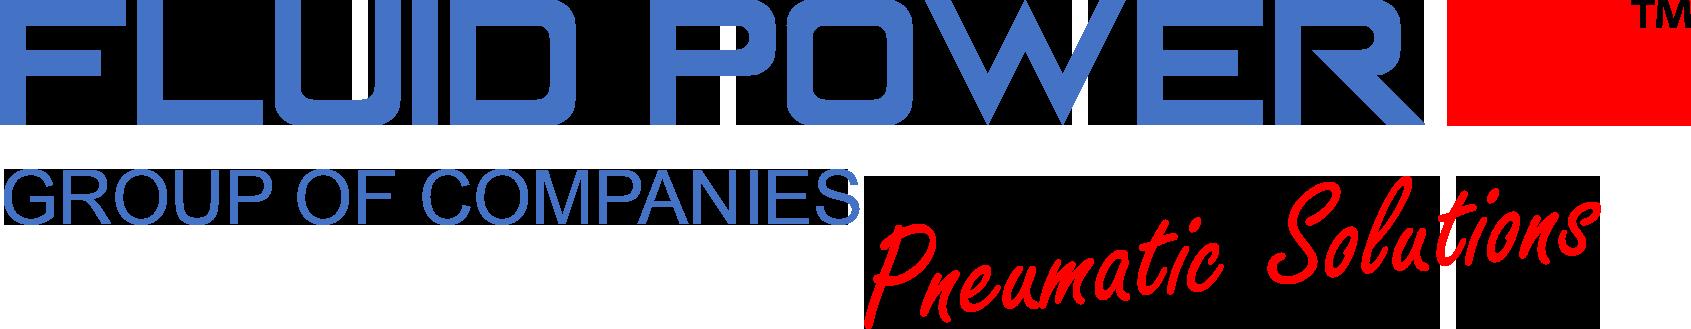 Fluid Power - Pneumatic Solutions Logo